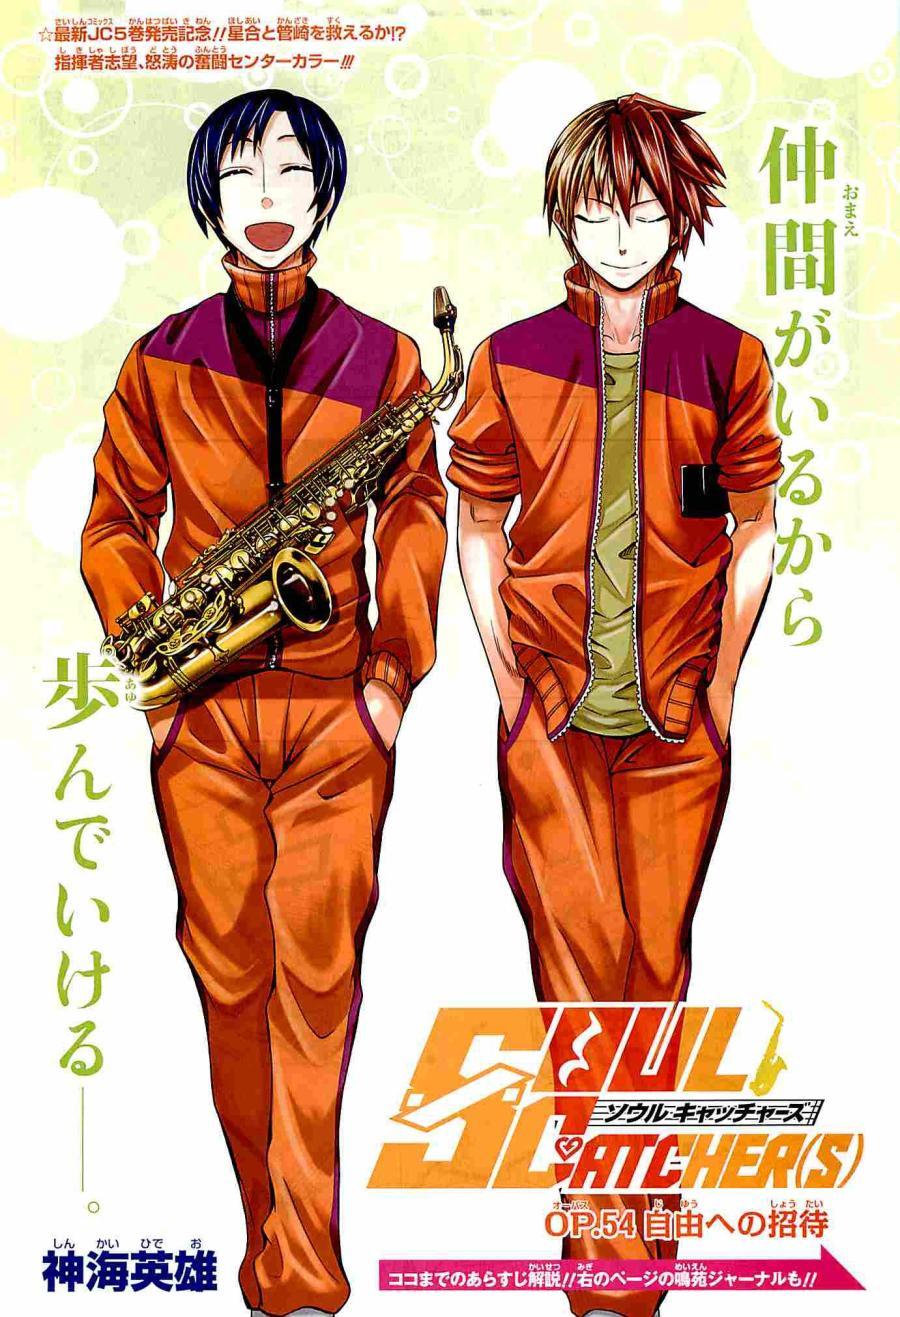 Soulcatchers Weekly Shonen Jump 2014 #29